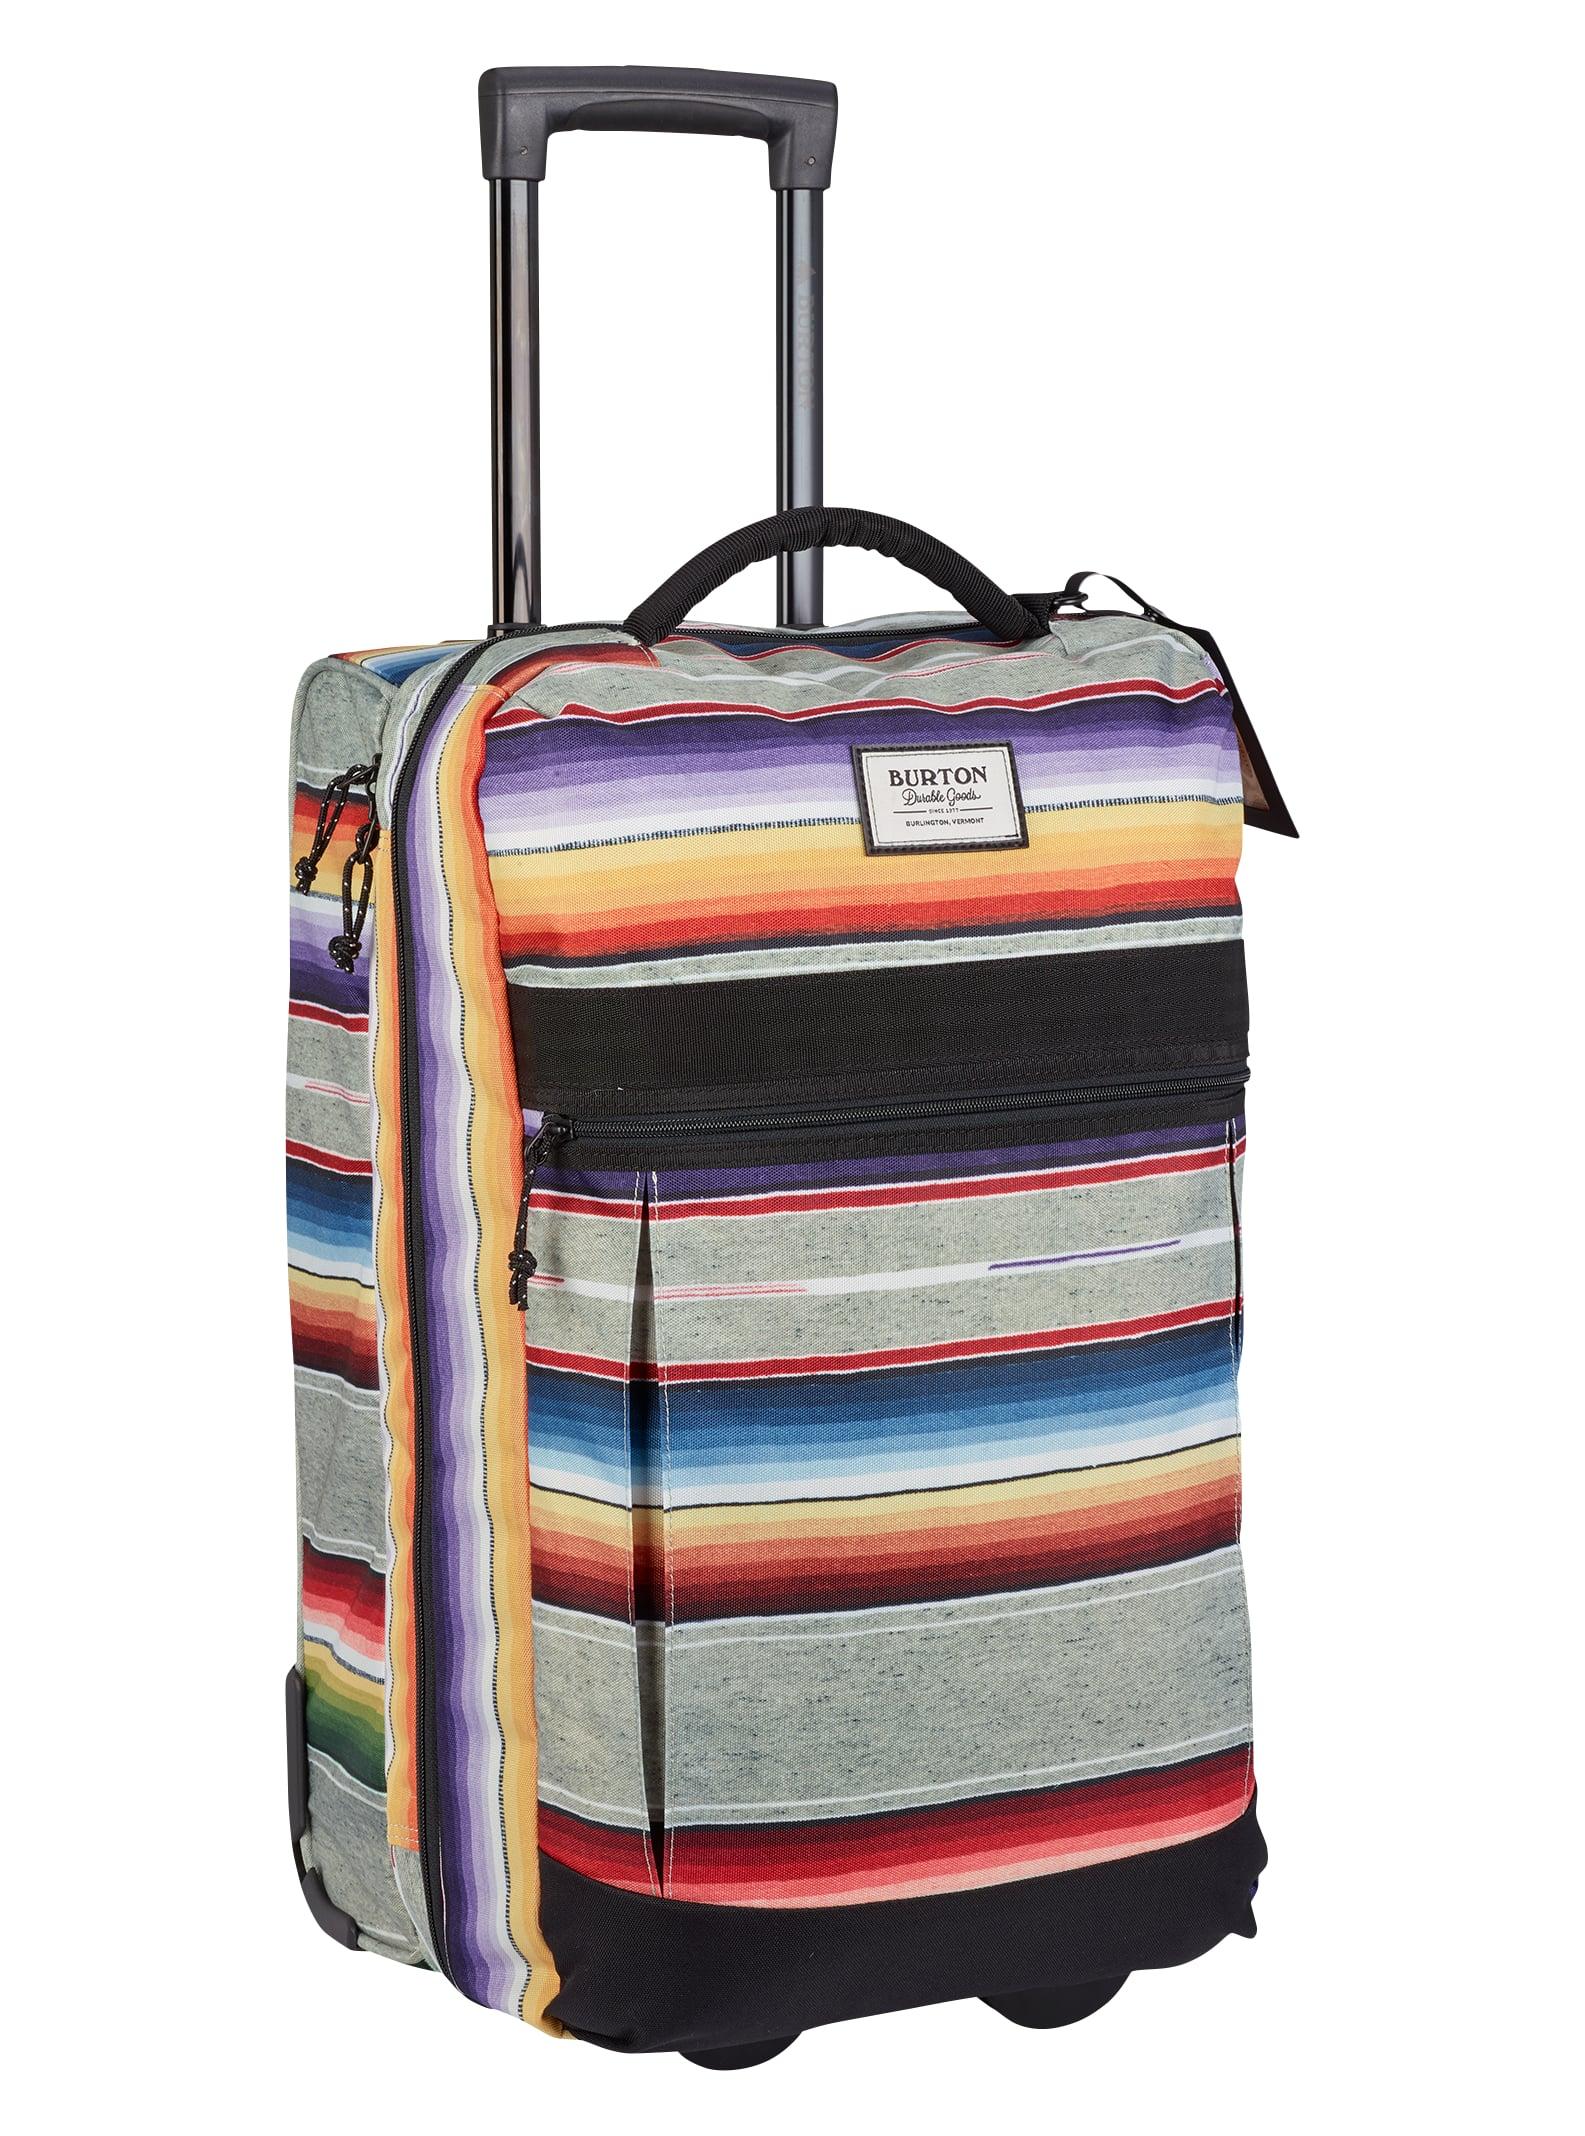 c21b3eae6f4ac Burton Charter Roller Travel Bag | Burton Snowboards Fall 2017